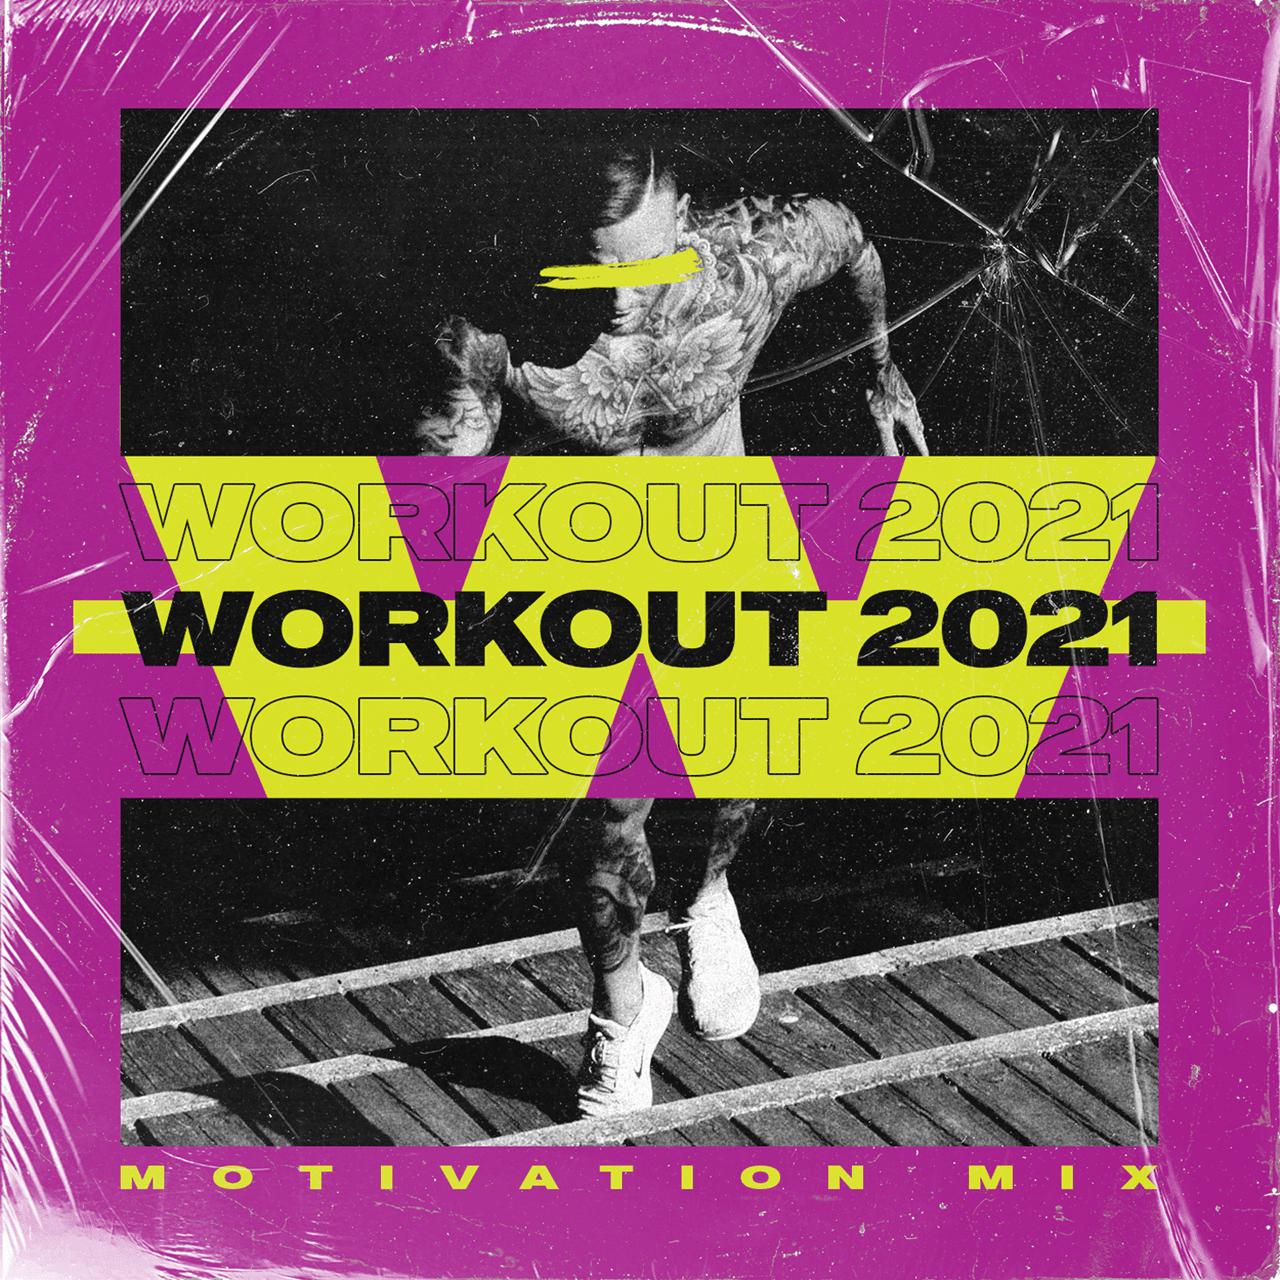 Workout 2021: Motivation Mix - 1